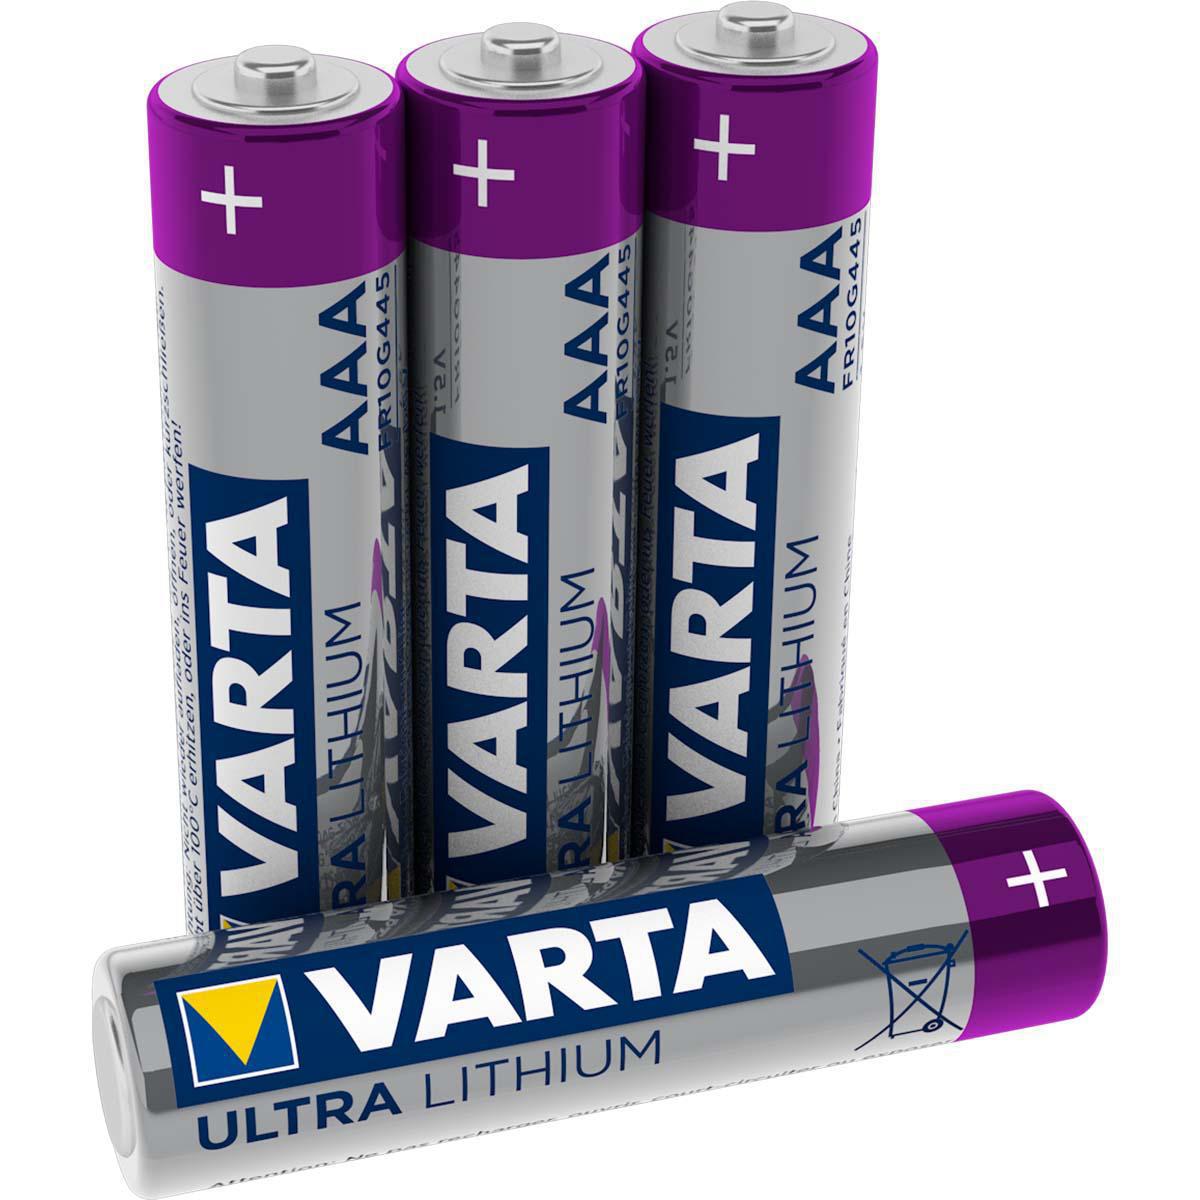 AAA lithium batterijen 4 stuks 1.5V